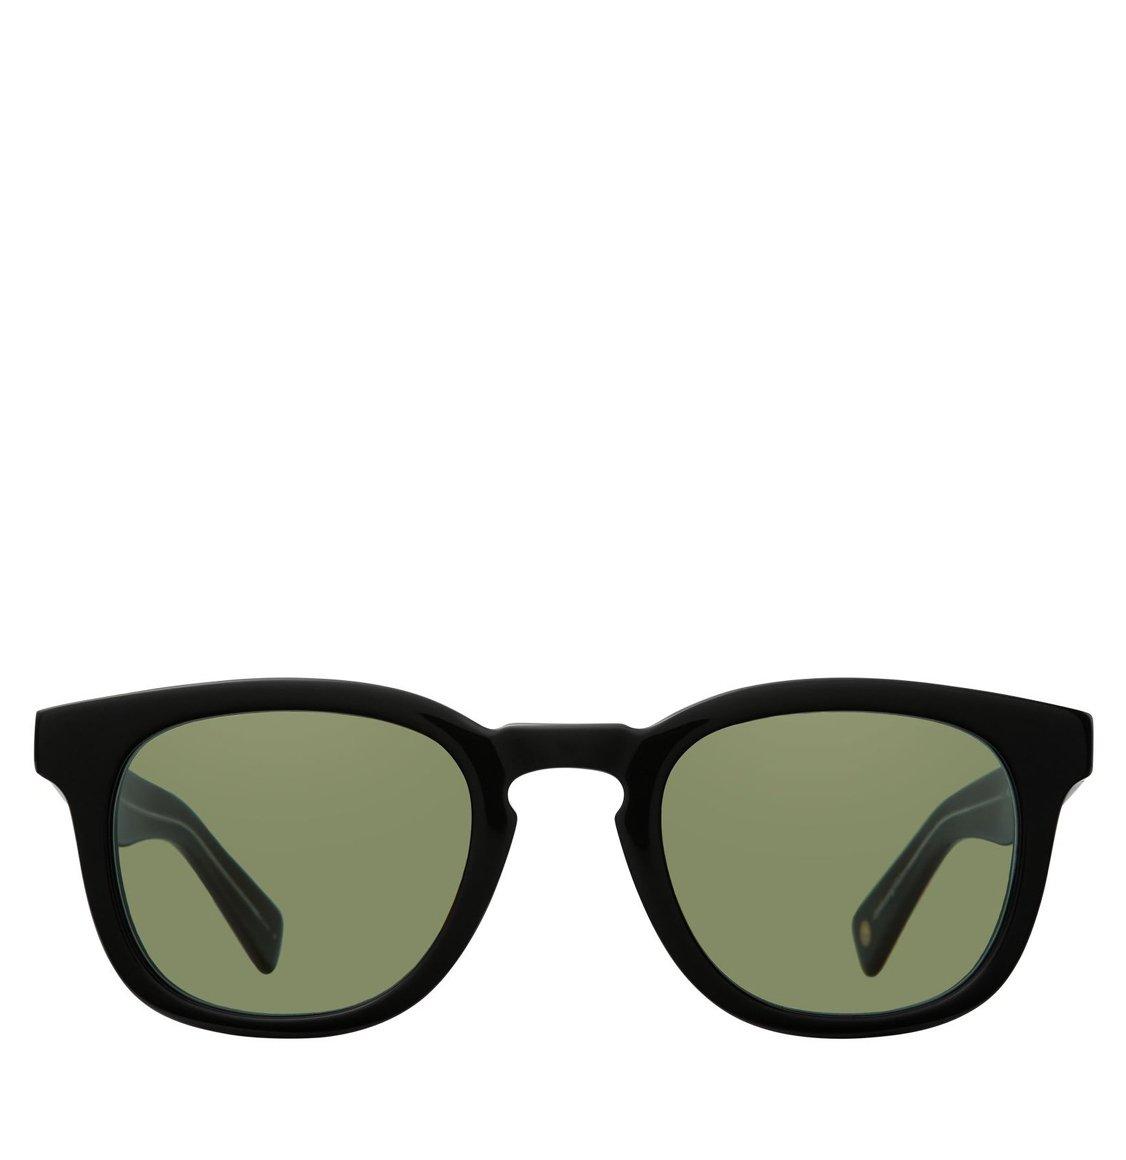 Garrett Leight Square Limited Edition Kinney X Black Γυαλιά Ηλίου